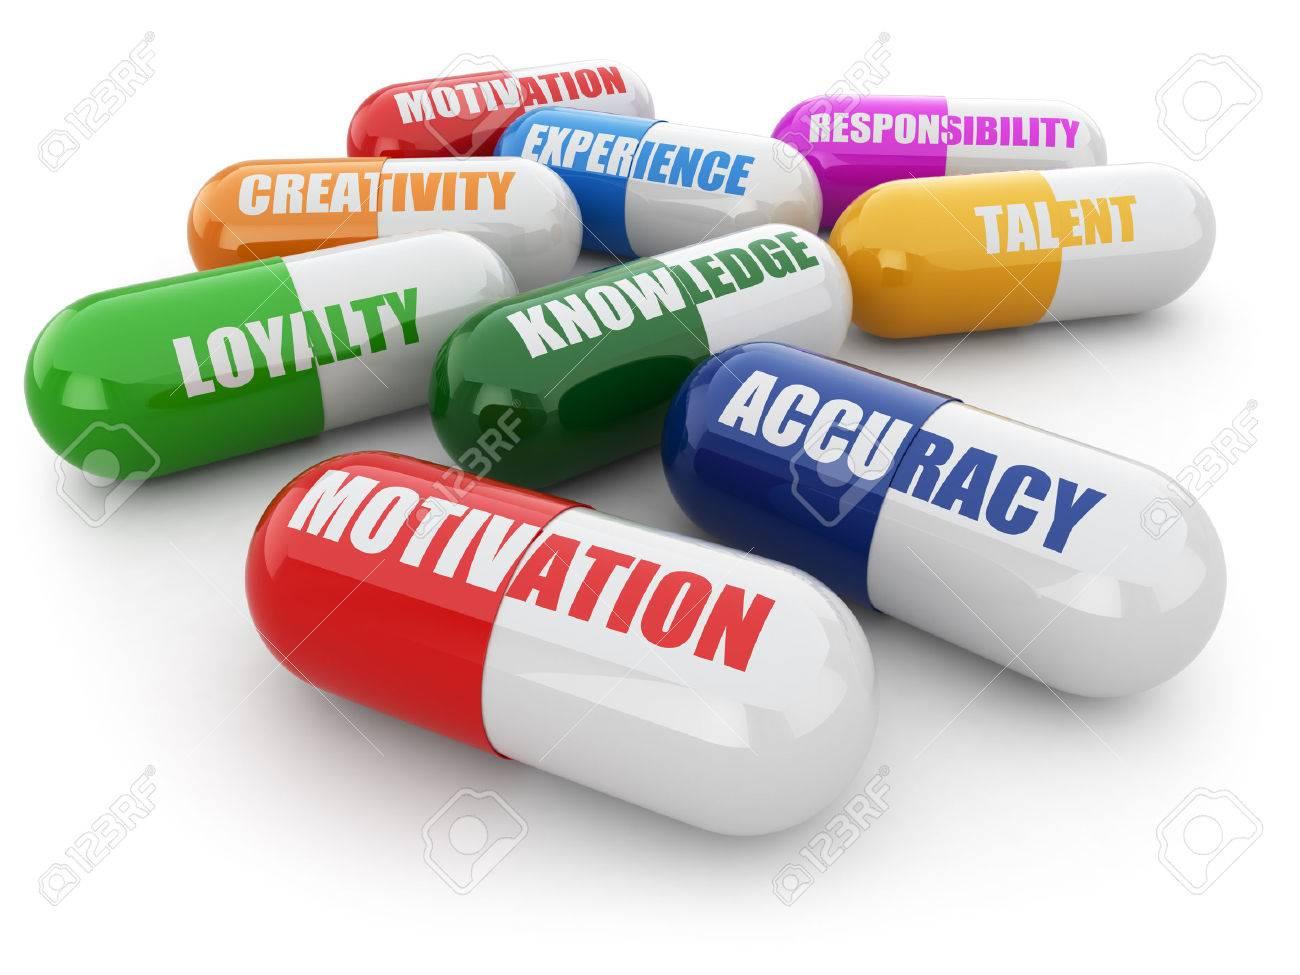 skills for success pills a list of positive qualities for skills for success pills a list of positive qualities for employment 3d stock